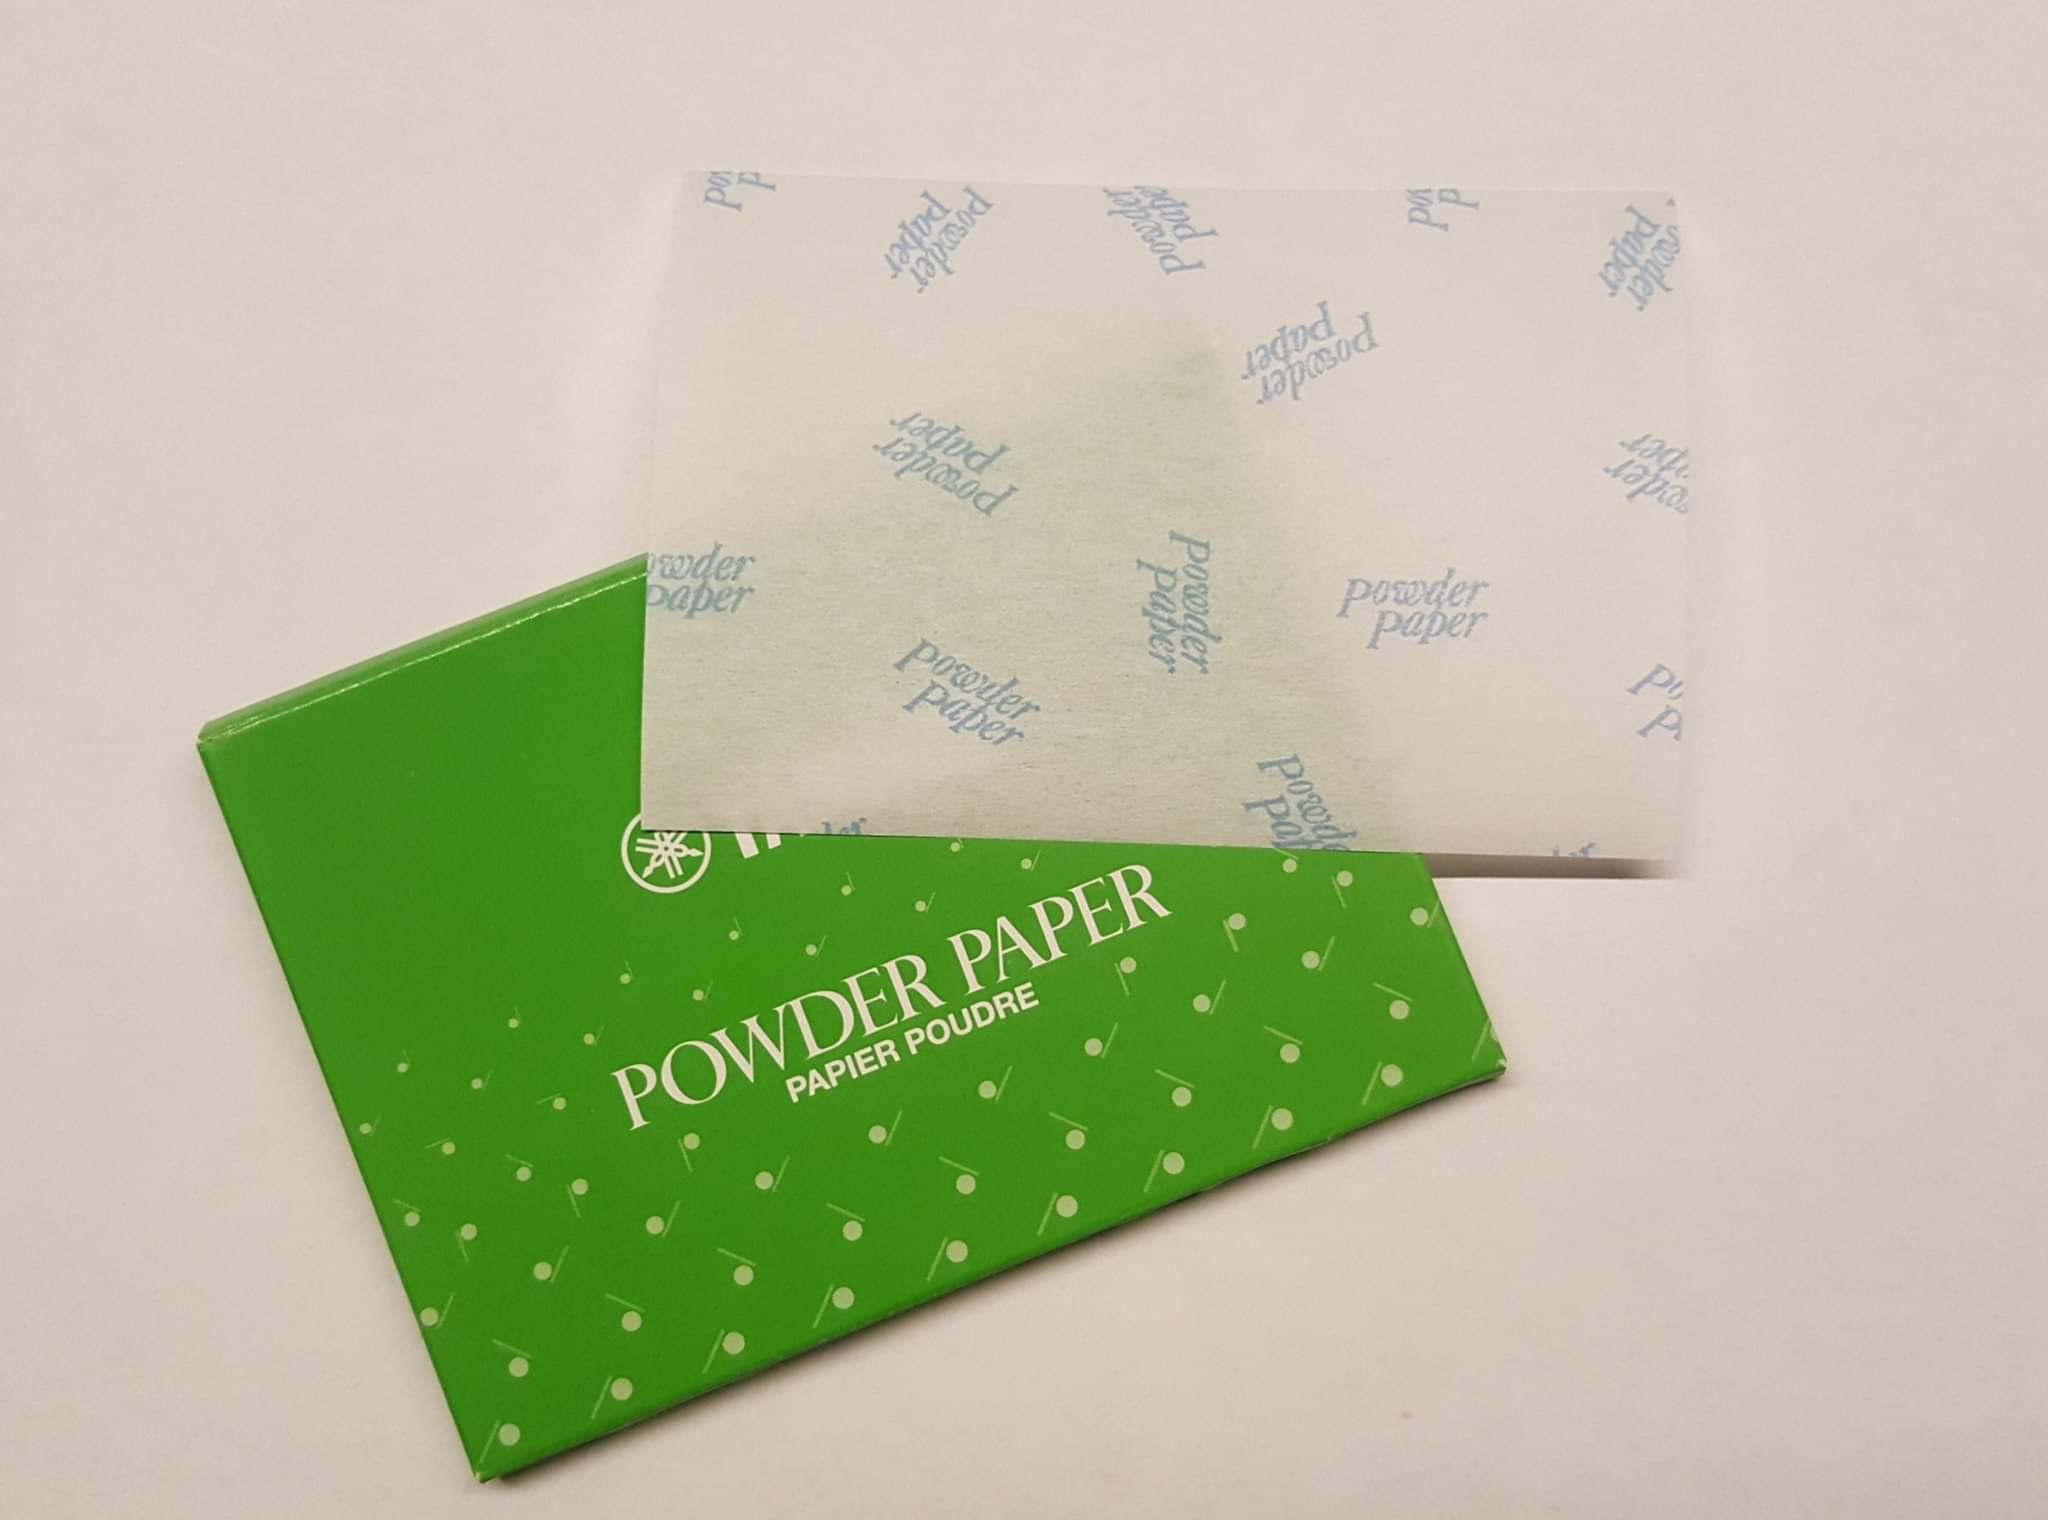 Powder paper